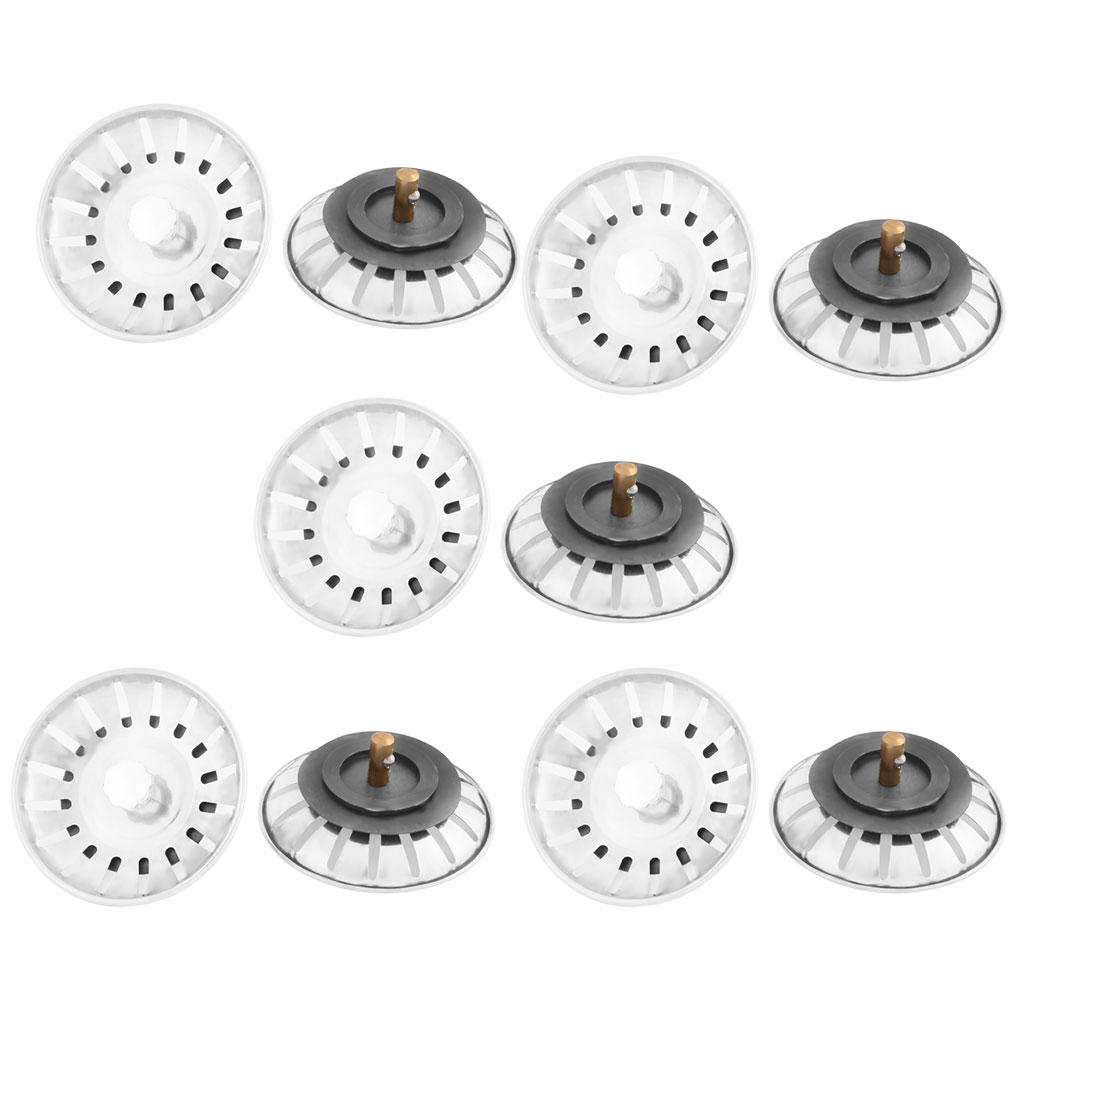 Kitchen Bathroom Mesh Hole Basin Disposer Sink Drain Strainer Stopper Silver Tone 10pcs